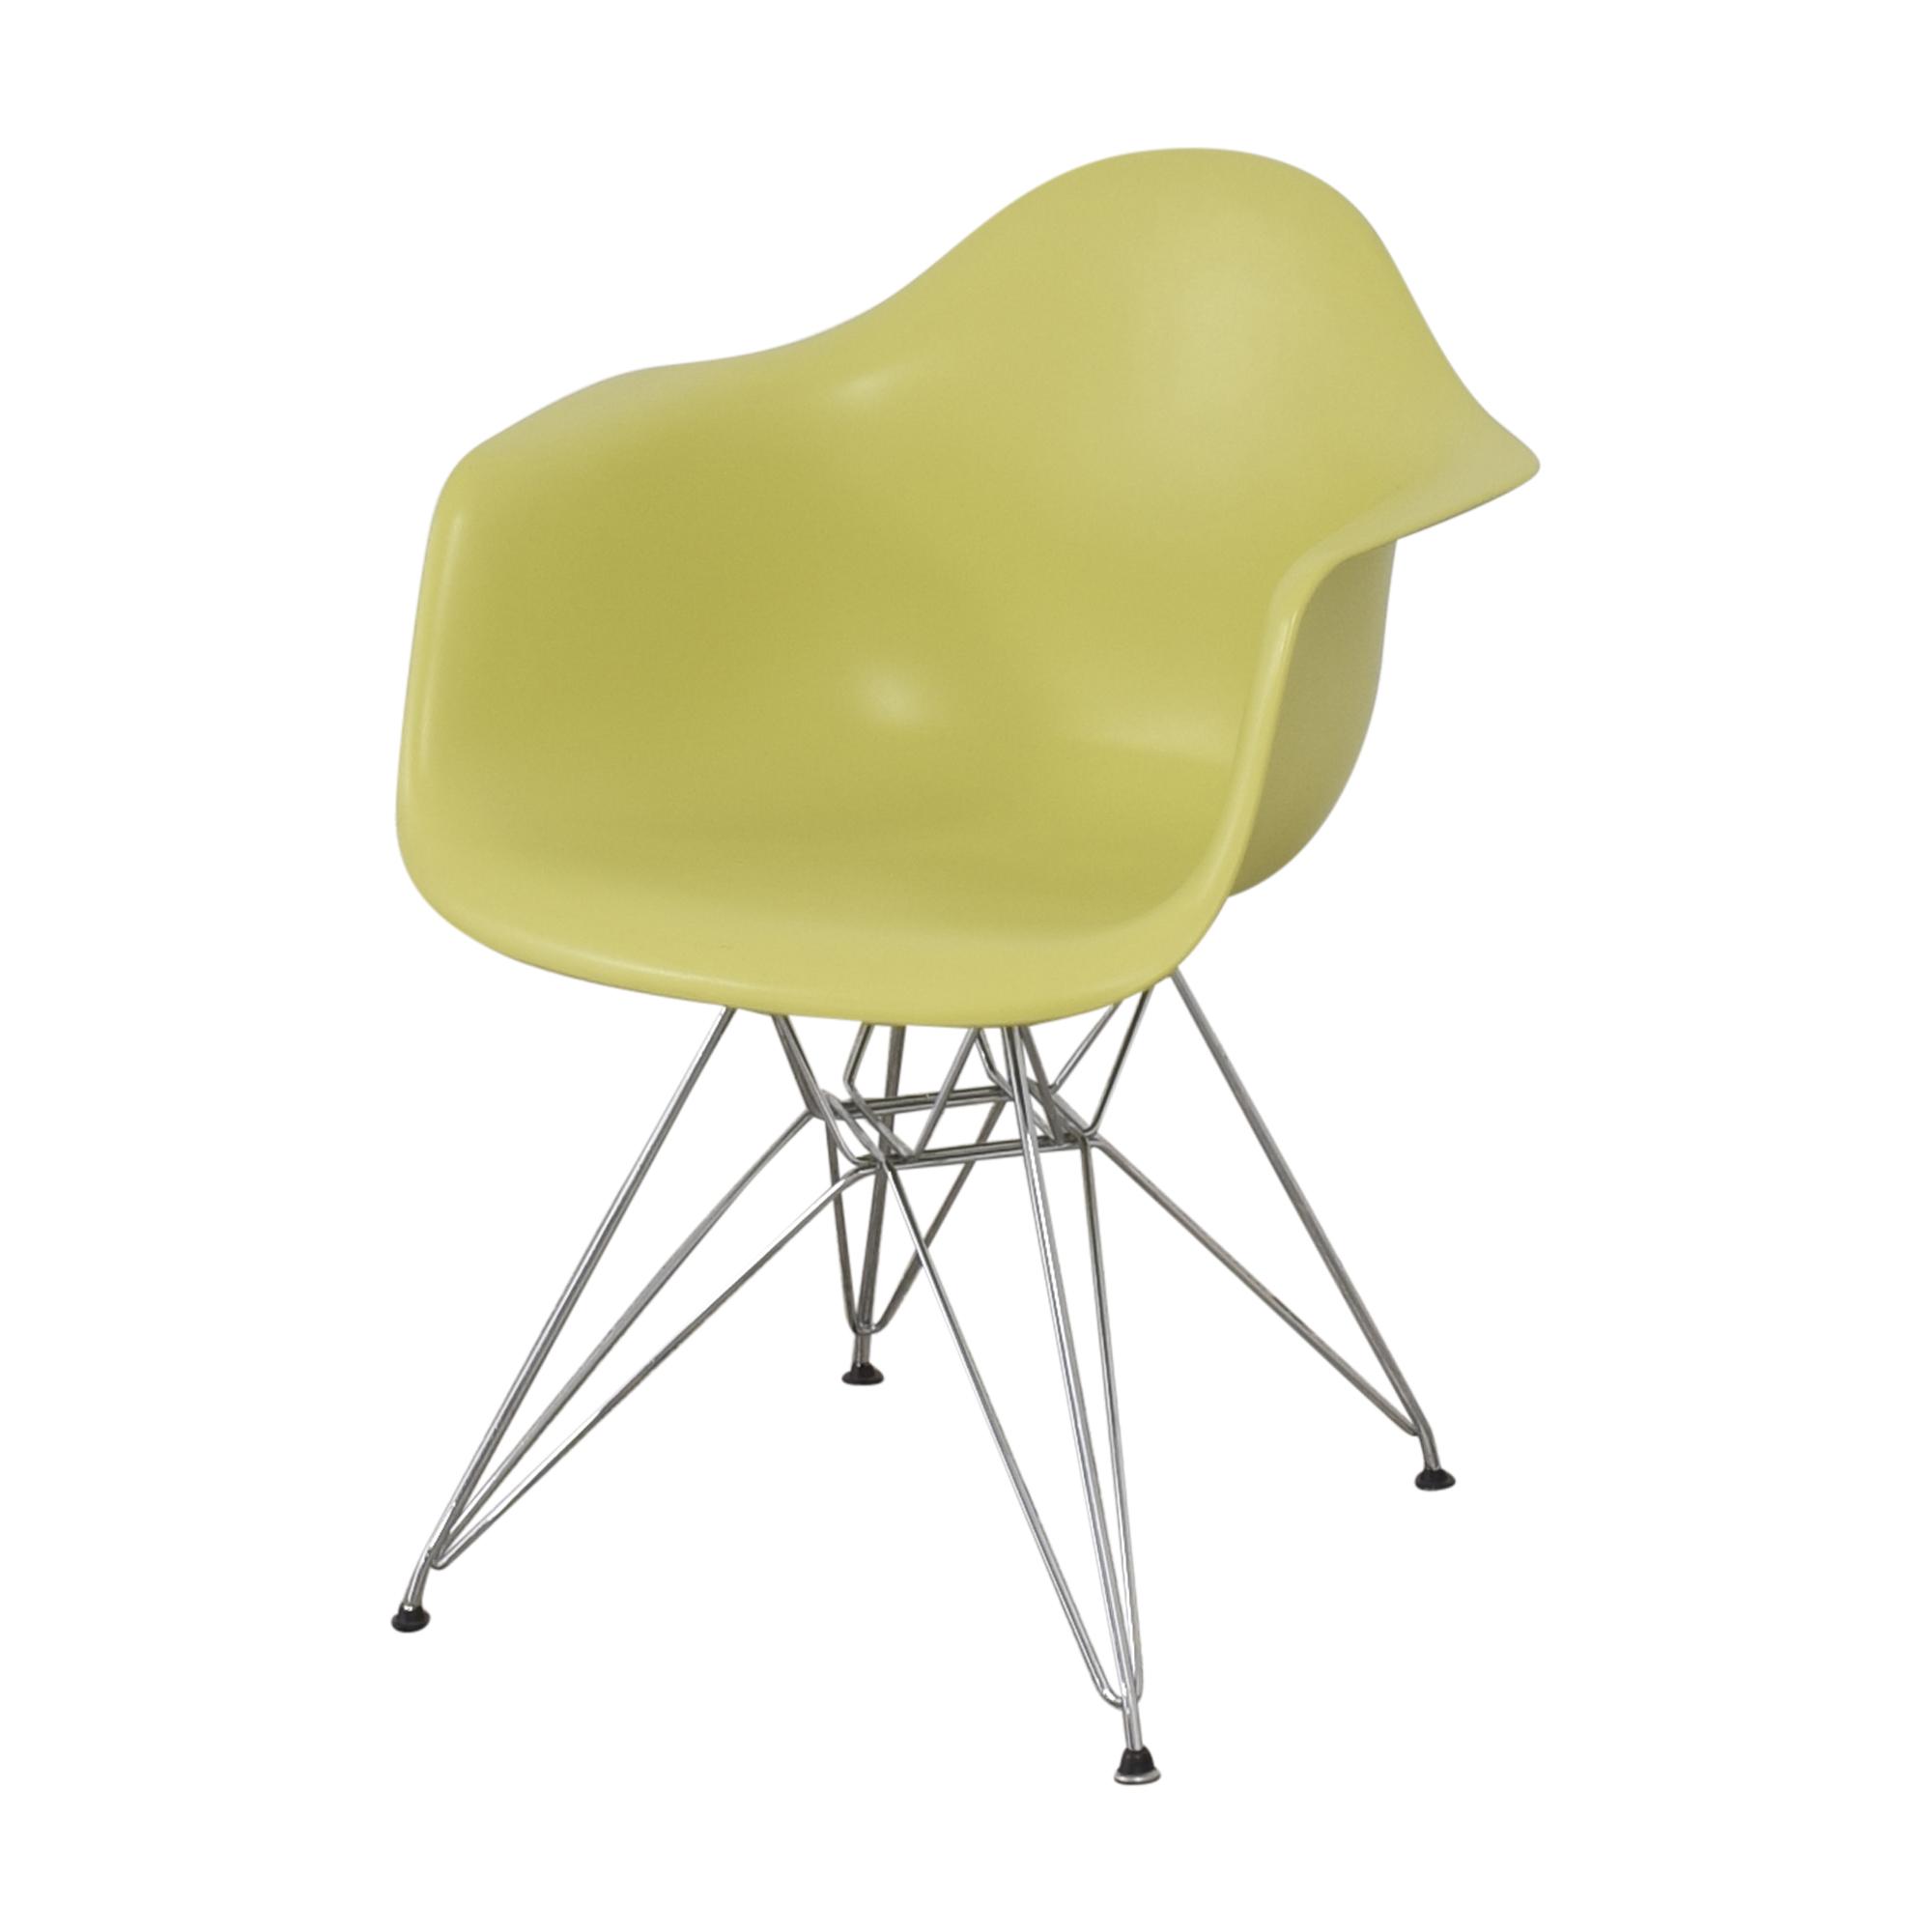 Herman Miller Herman Miller Eames Molded Armchairs discount